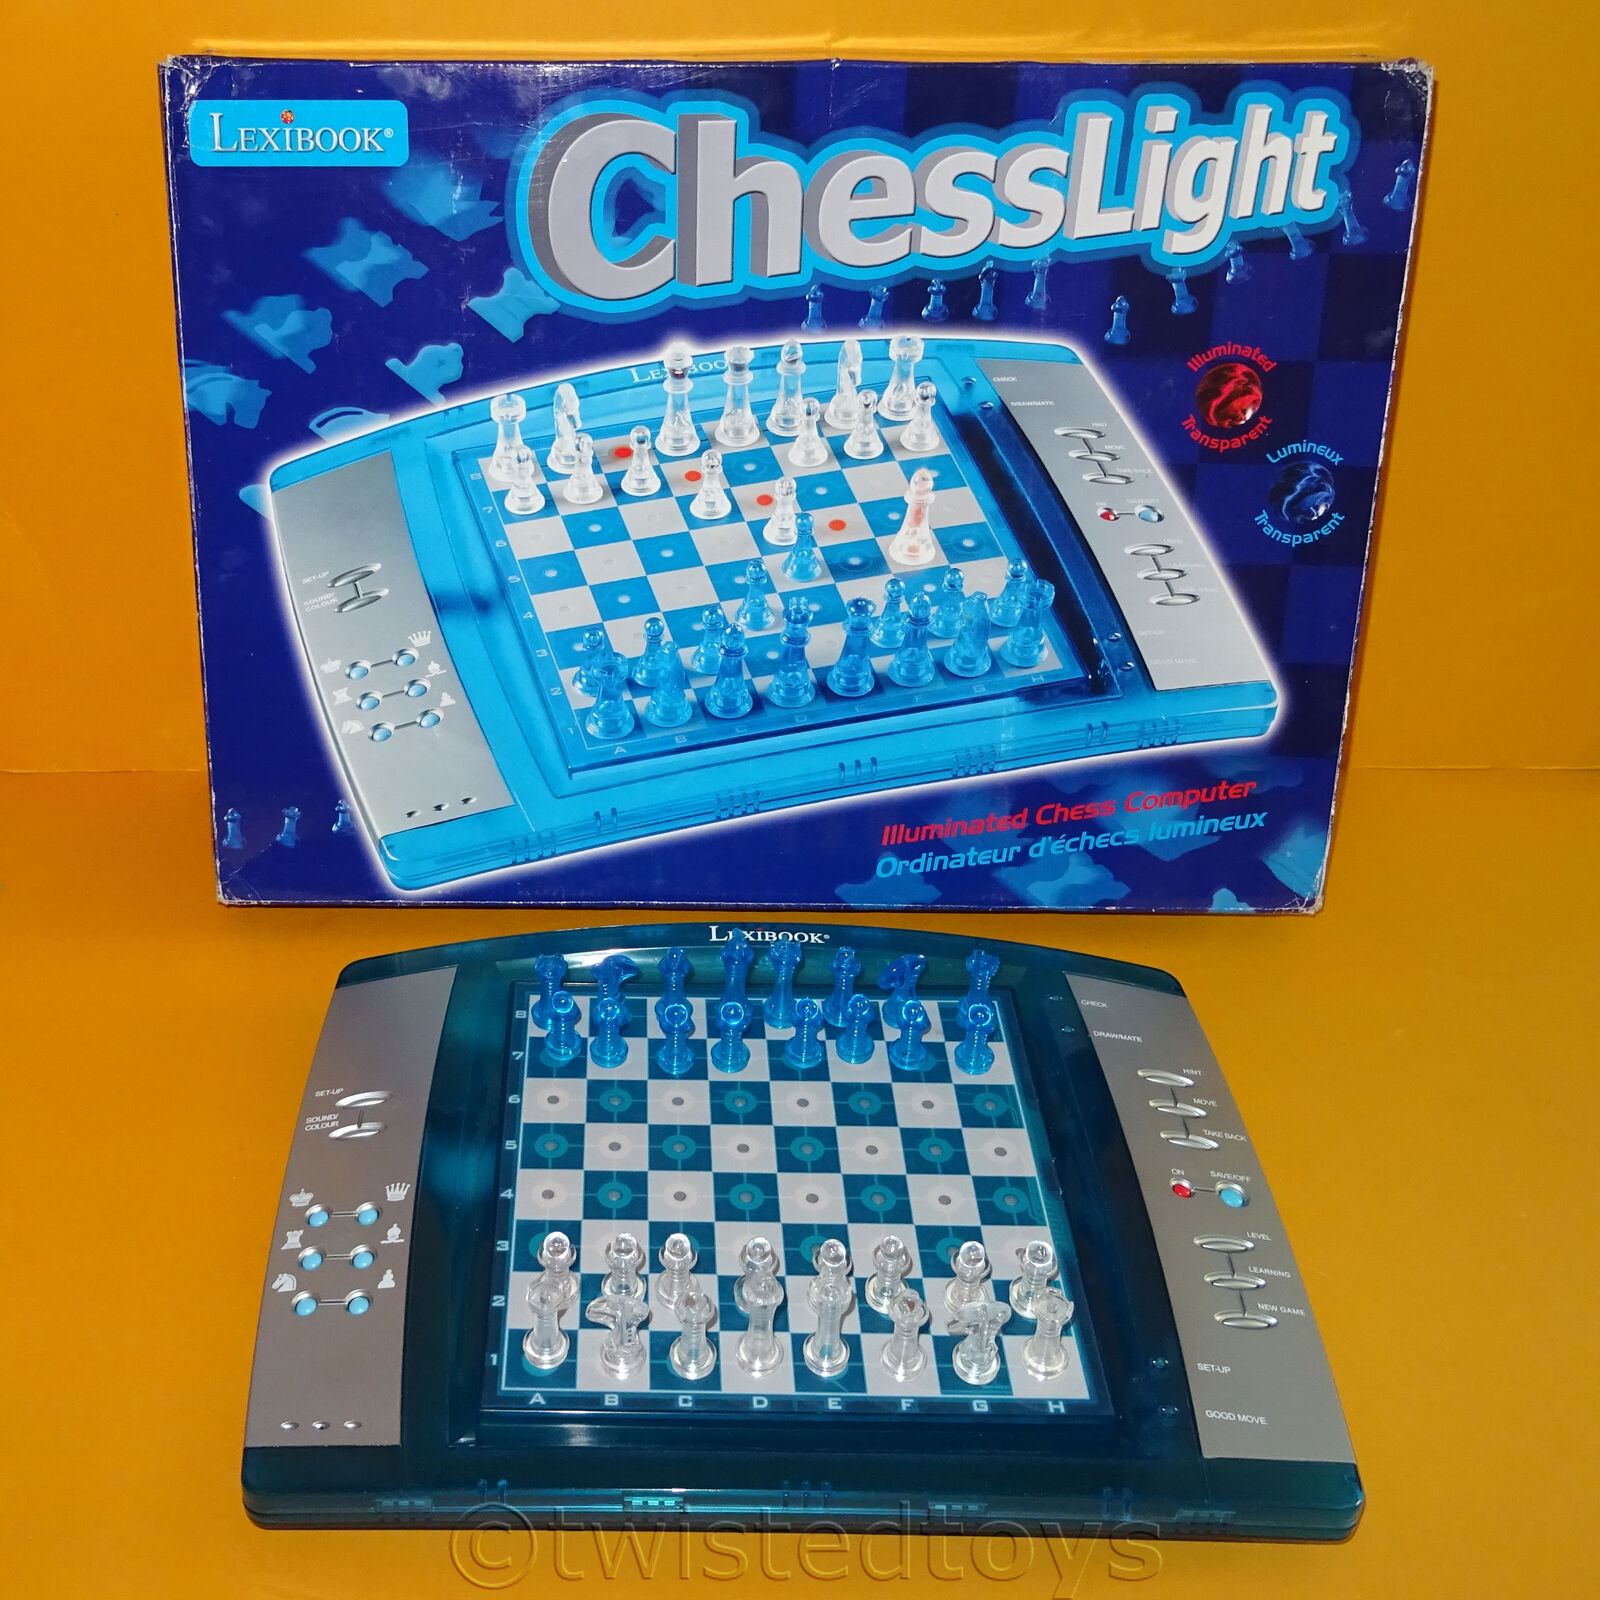 2009 LEXIBOOK LCG3000 CHESSLIGHT ILLUMINATED ELECTRONIC CHESS COMPUTER SET GAME